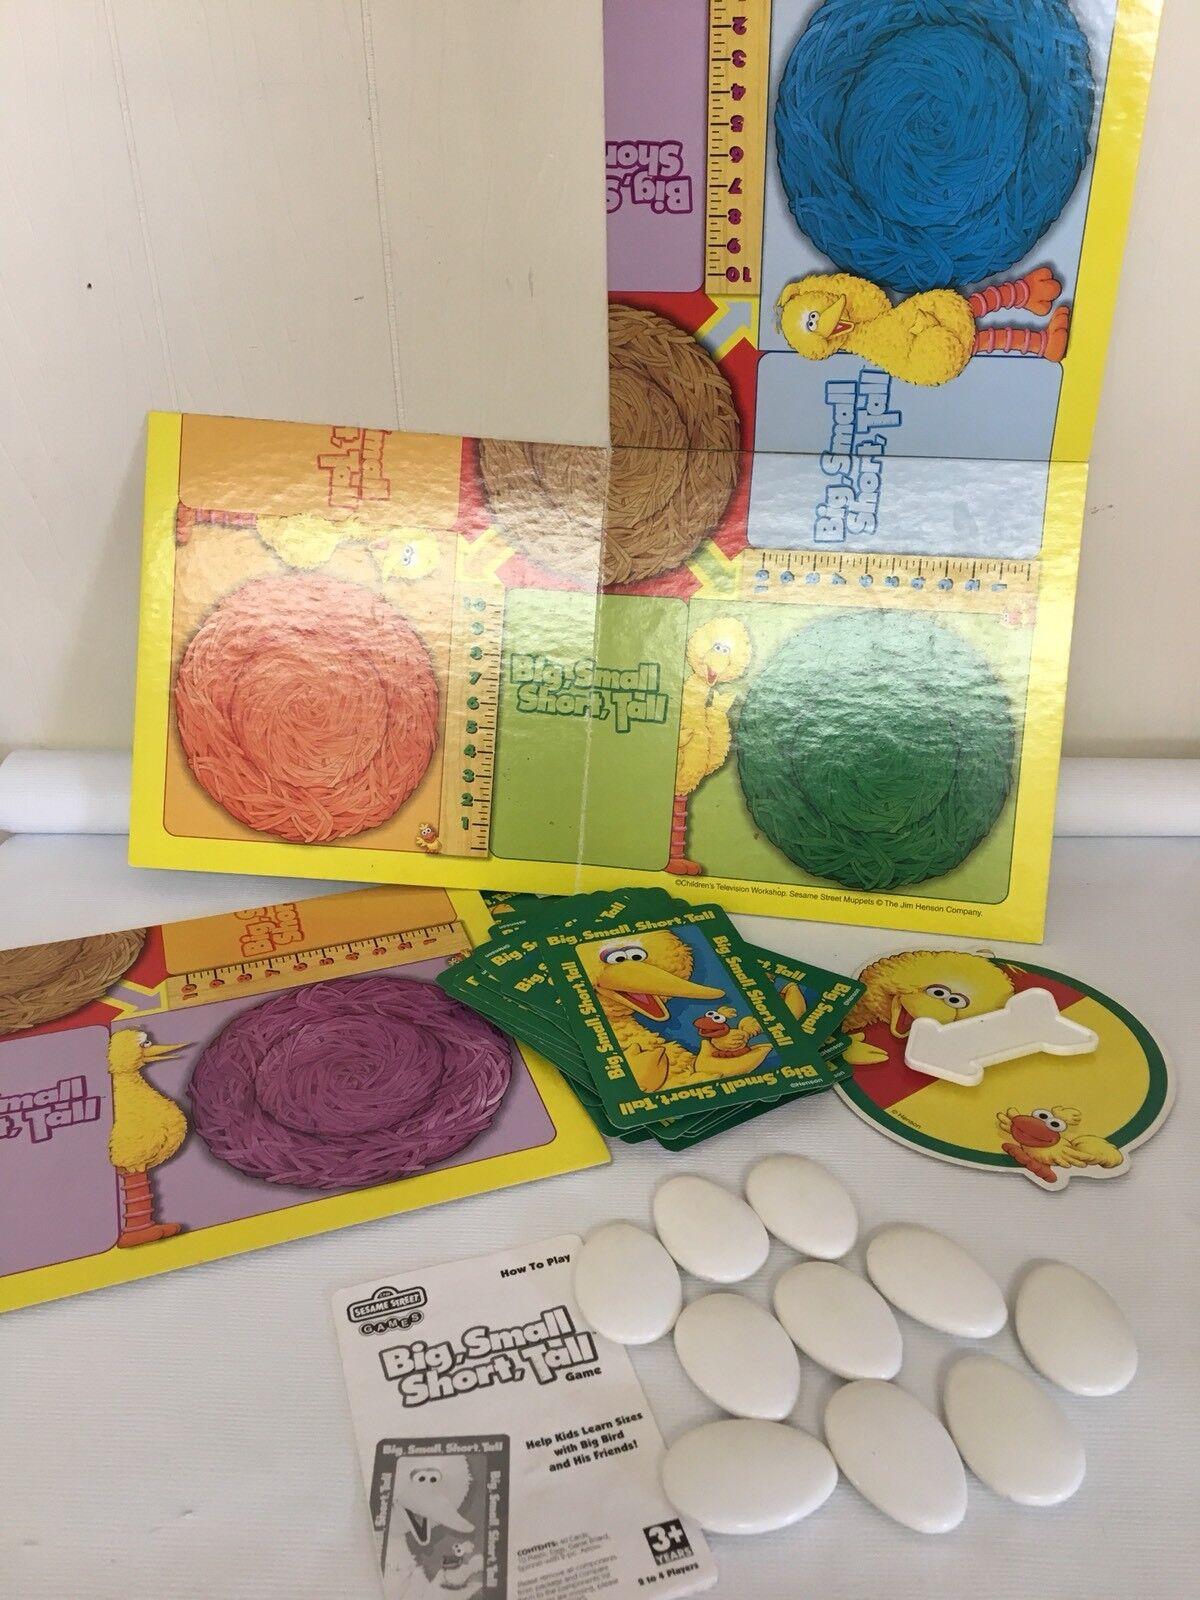 Big Small Short Tall Sesame Street Board Game Learn Sizes Big Bird Friends HTF